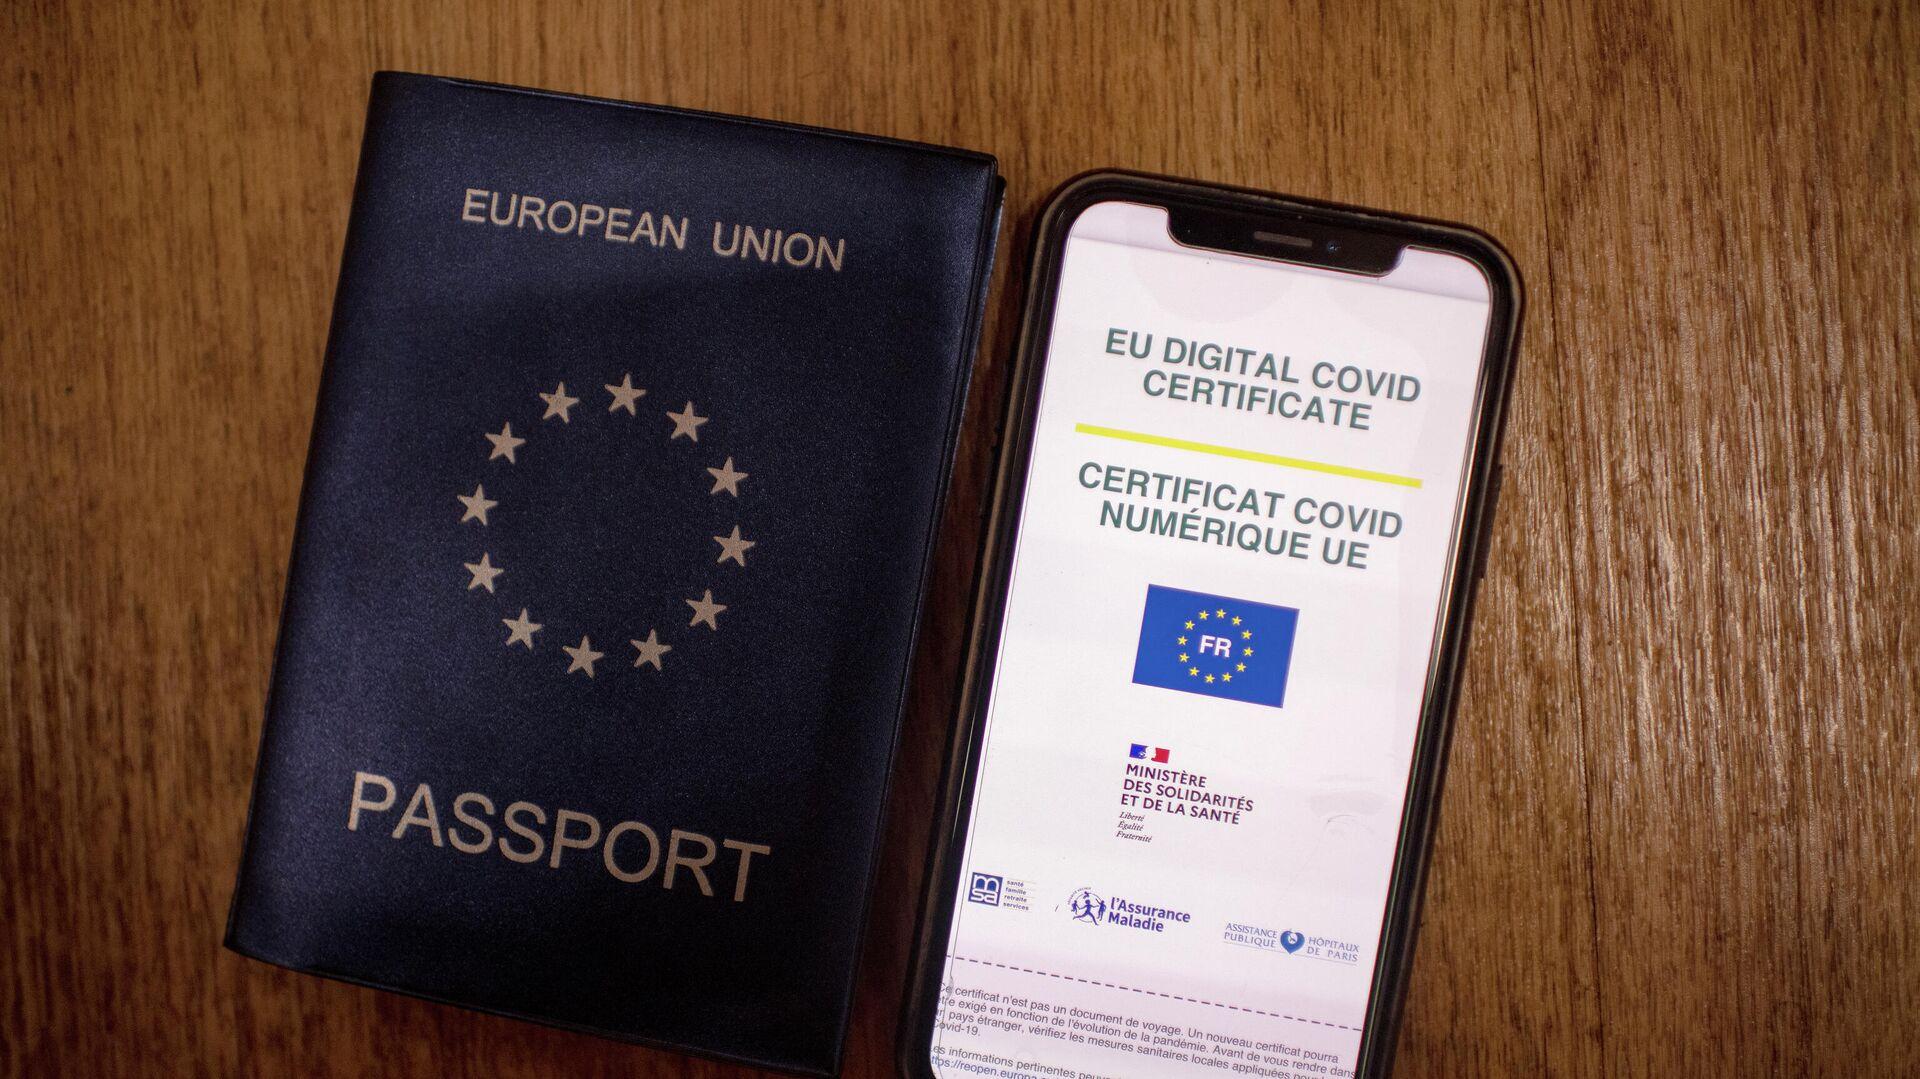 certificado COVID digital en la Unión Europea (UE) - Sputnik Mundo, 1920, 01.07.2021